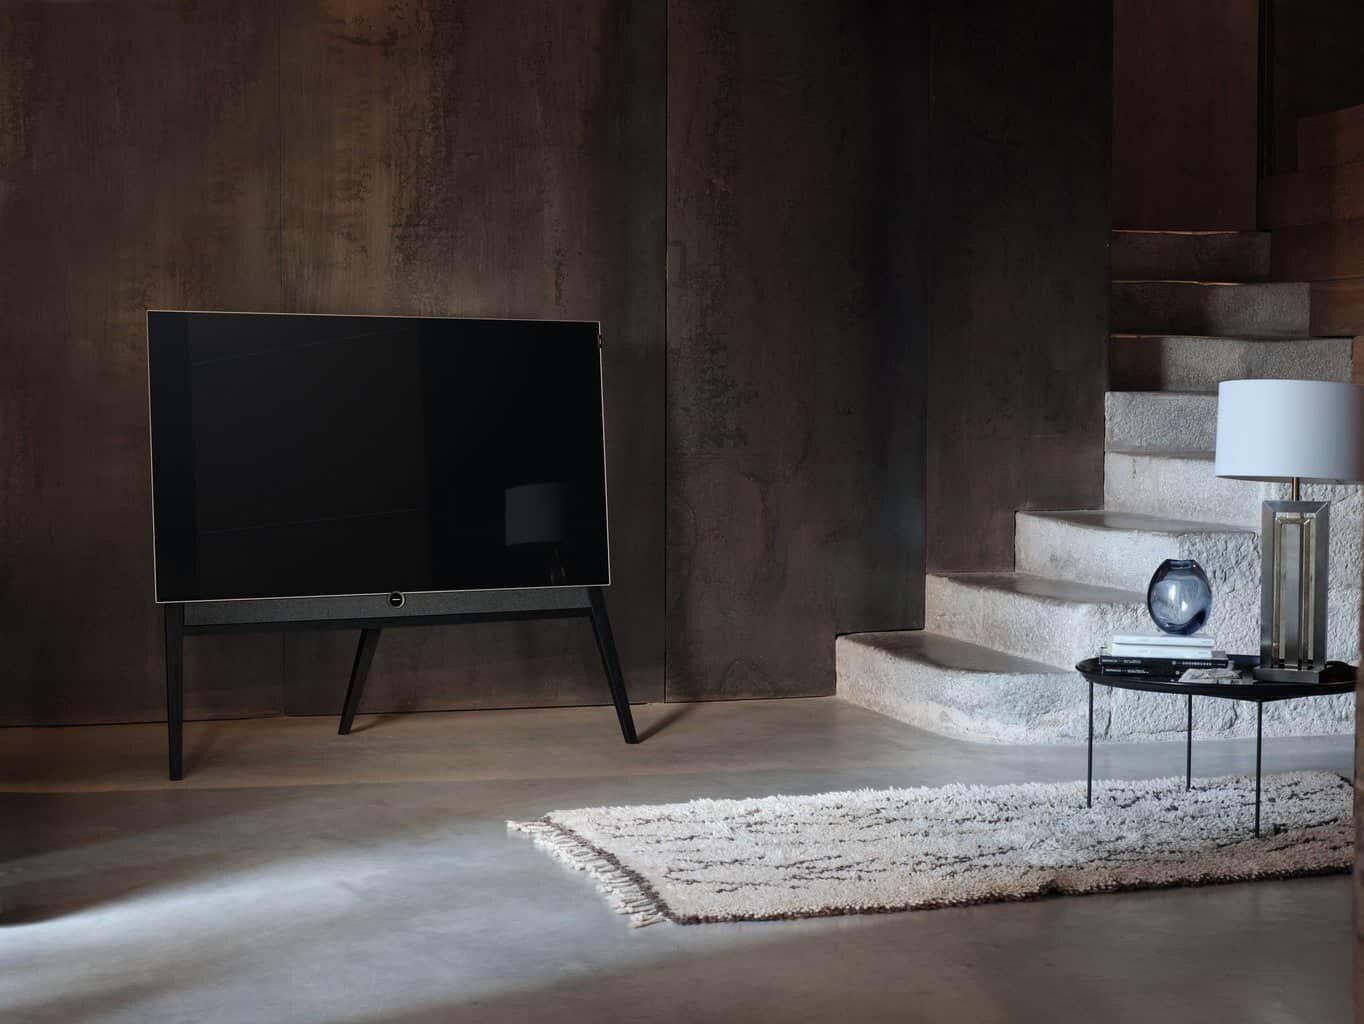 neu loewe bild 5 oled heimkinopartner bremen. Black Bedroom Furniture Sets. Home Design Ideas